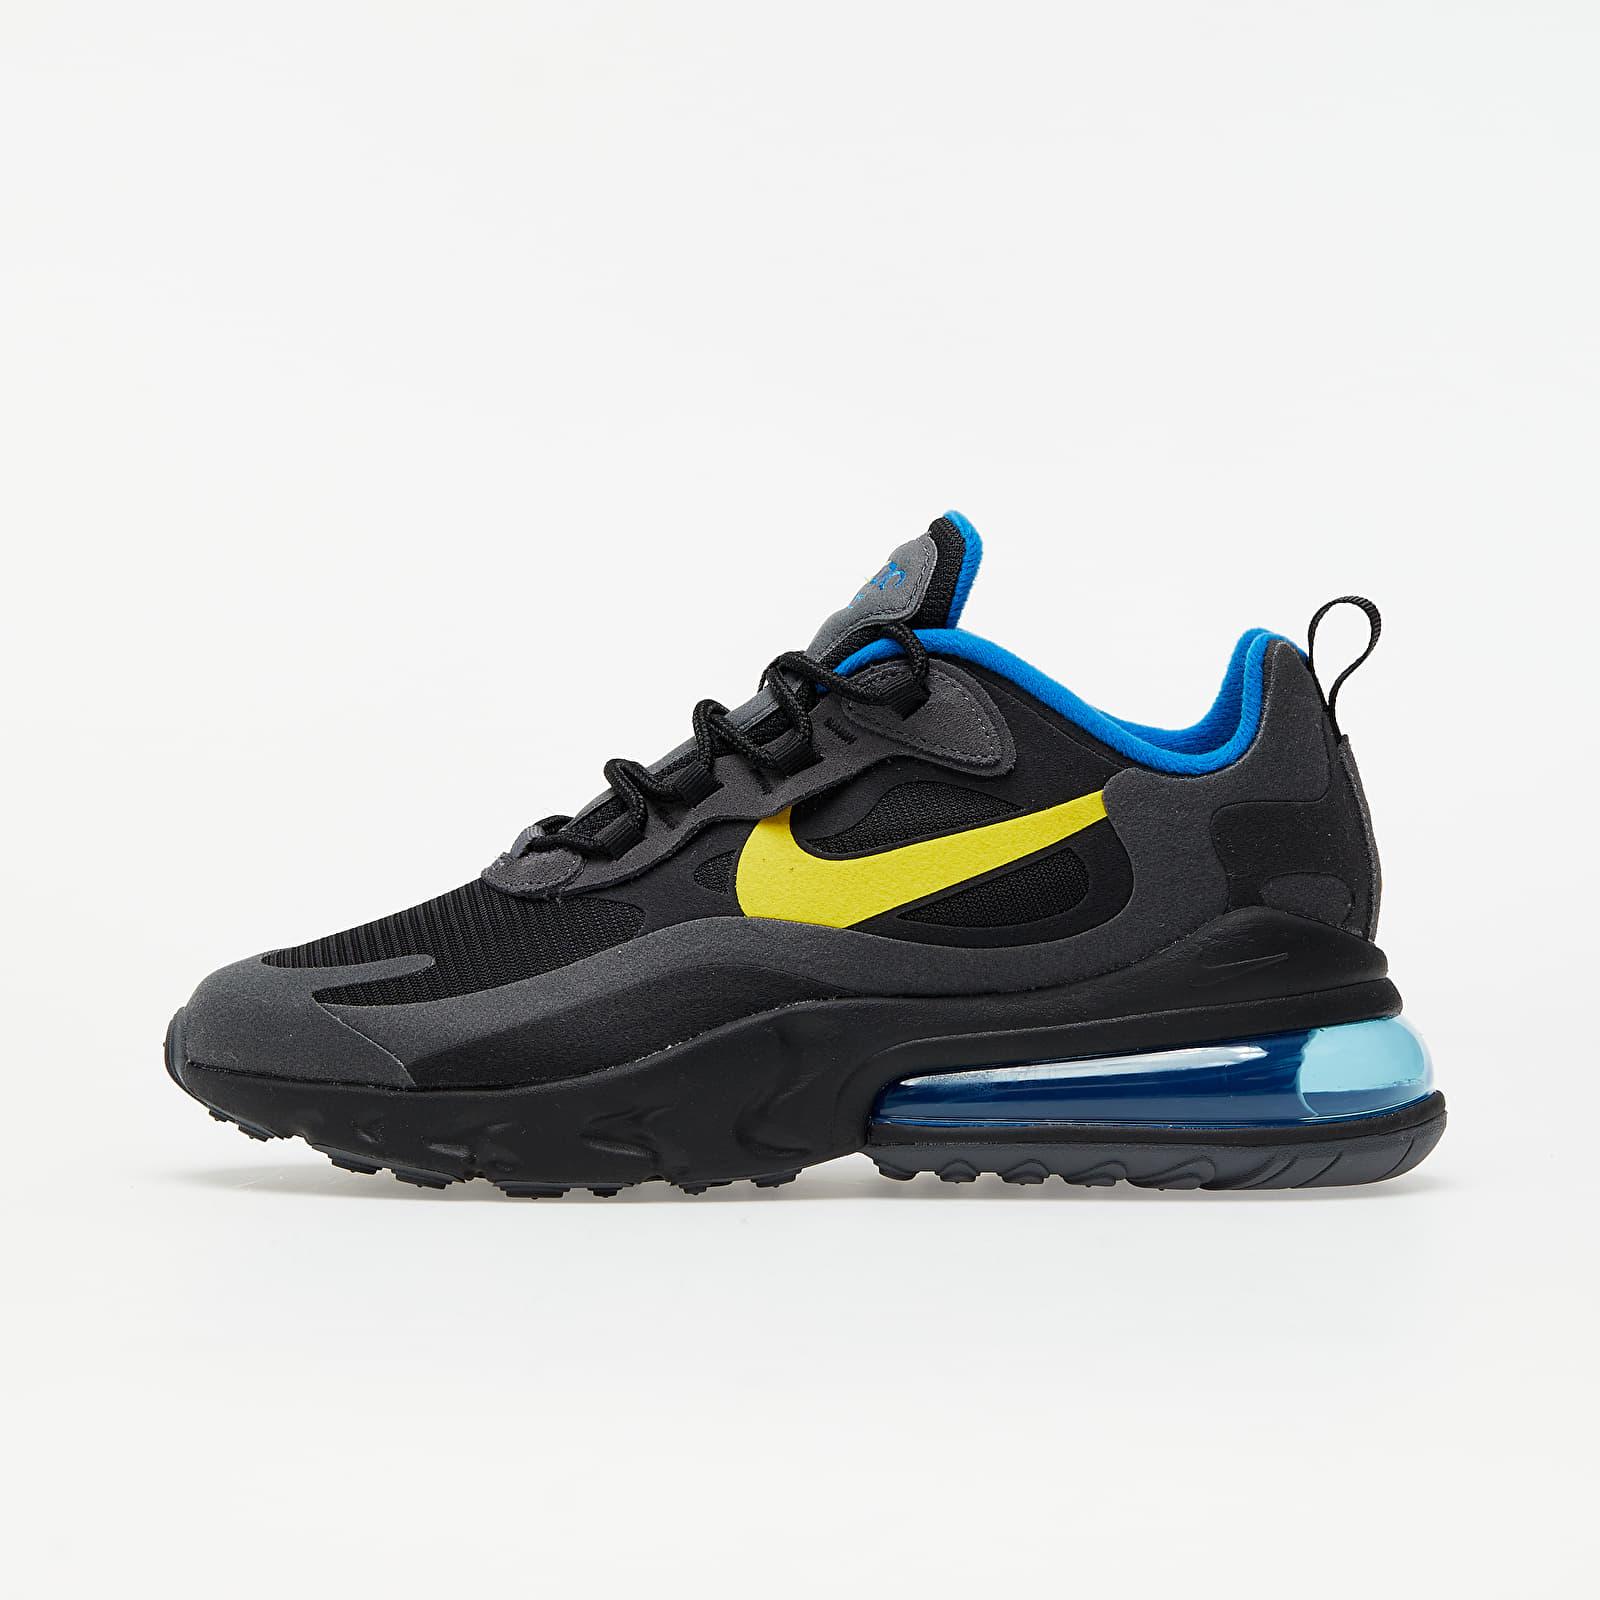 Nike Air Max 270 React Black/ Tour Yellow-Dark Grey-Blue Spark EUR 42.5